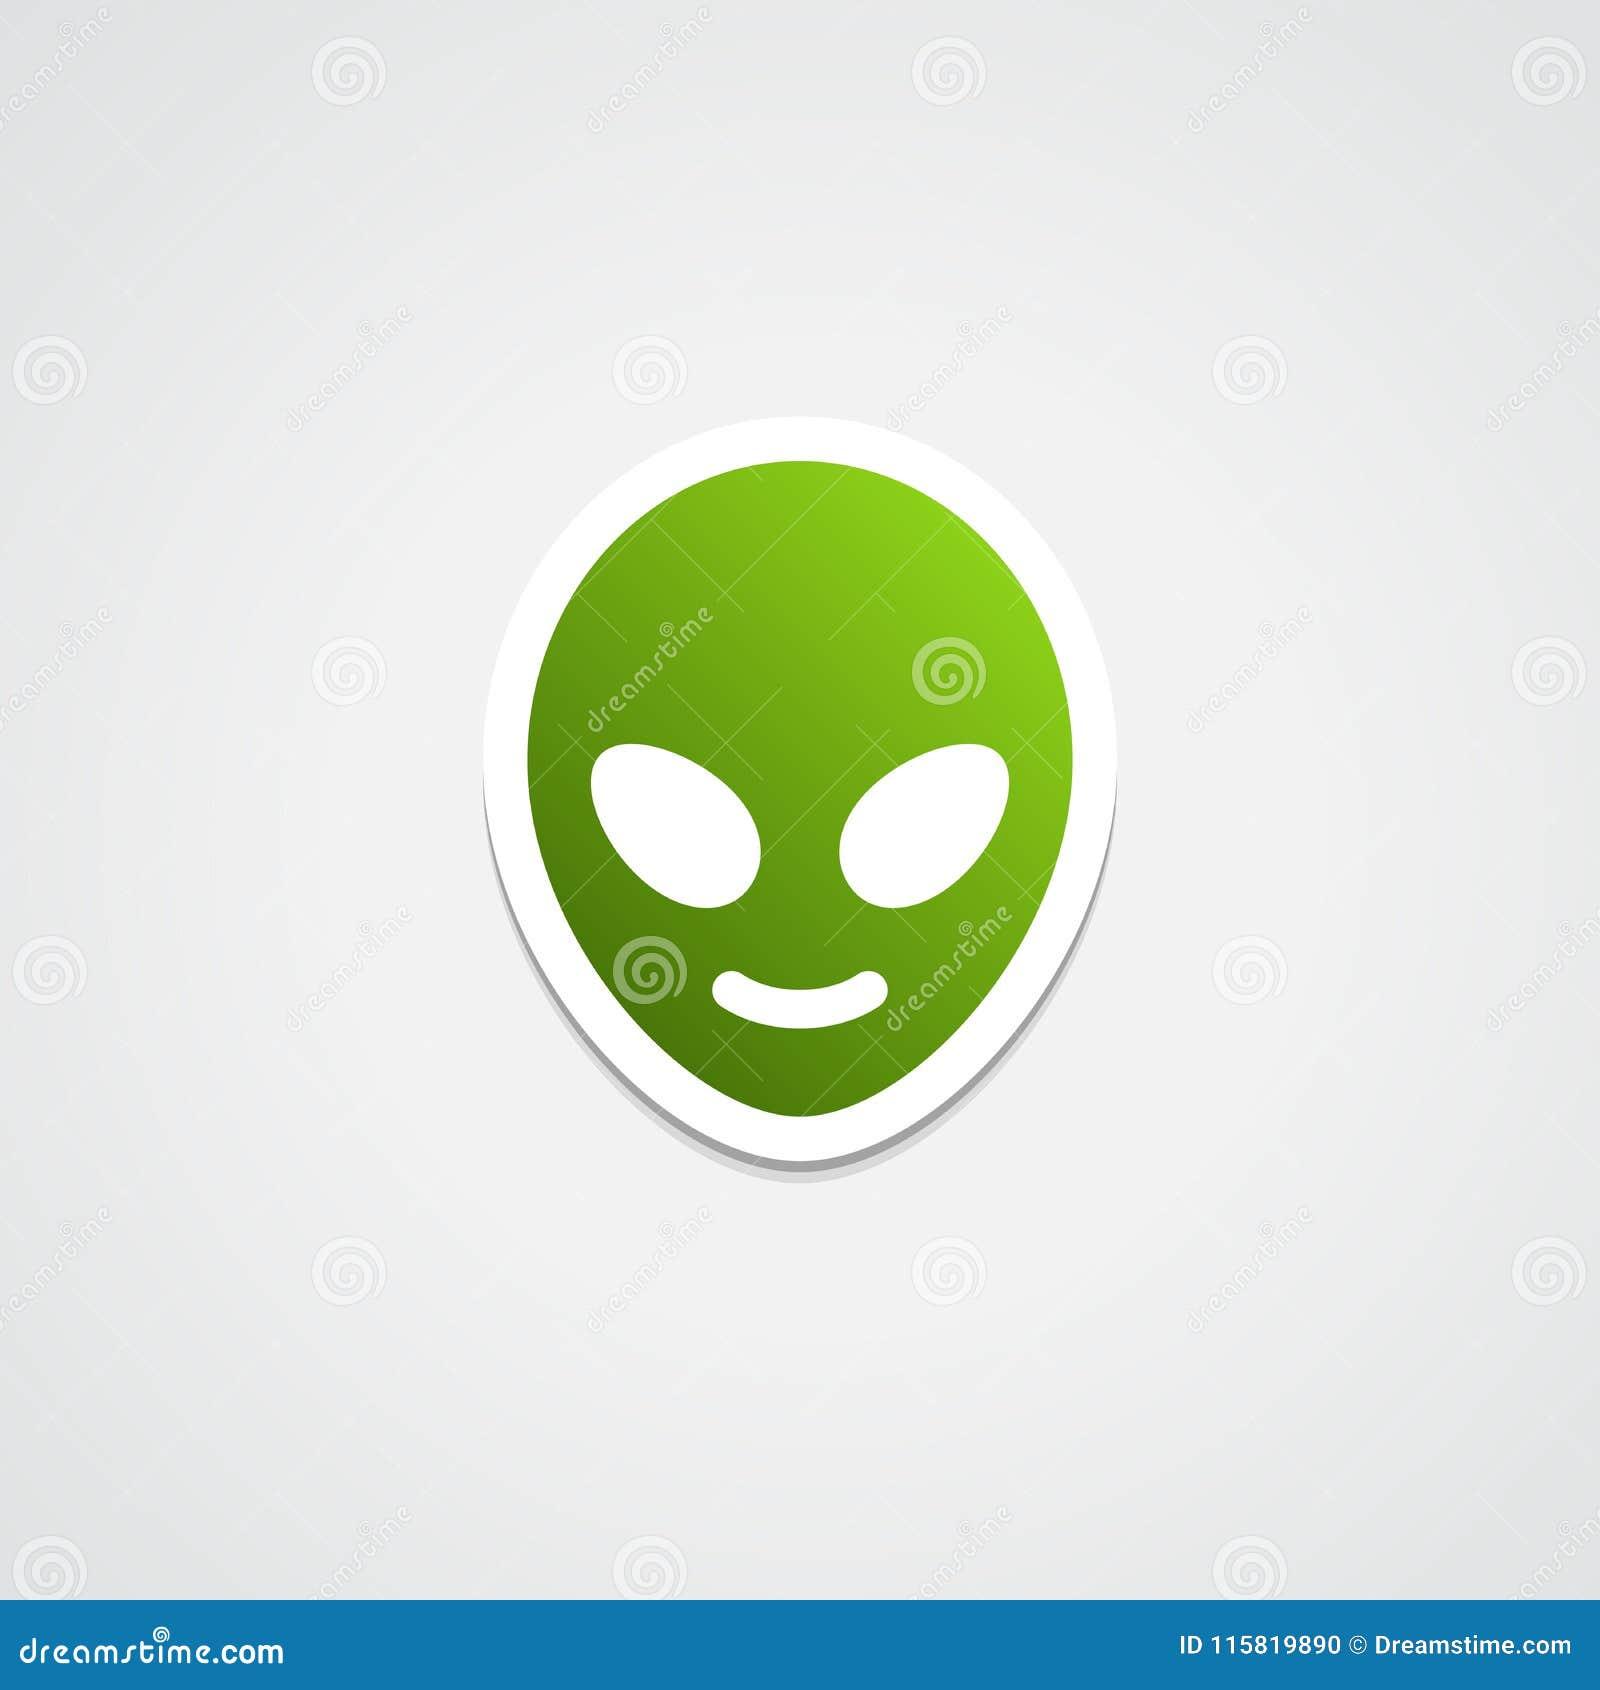 Alien Emoji Sticker Icon stock illustration  Illustration of